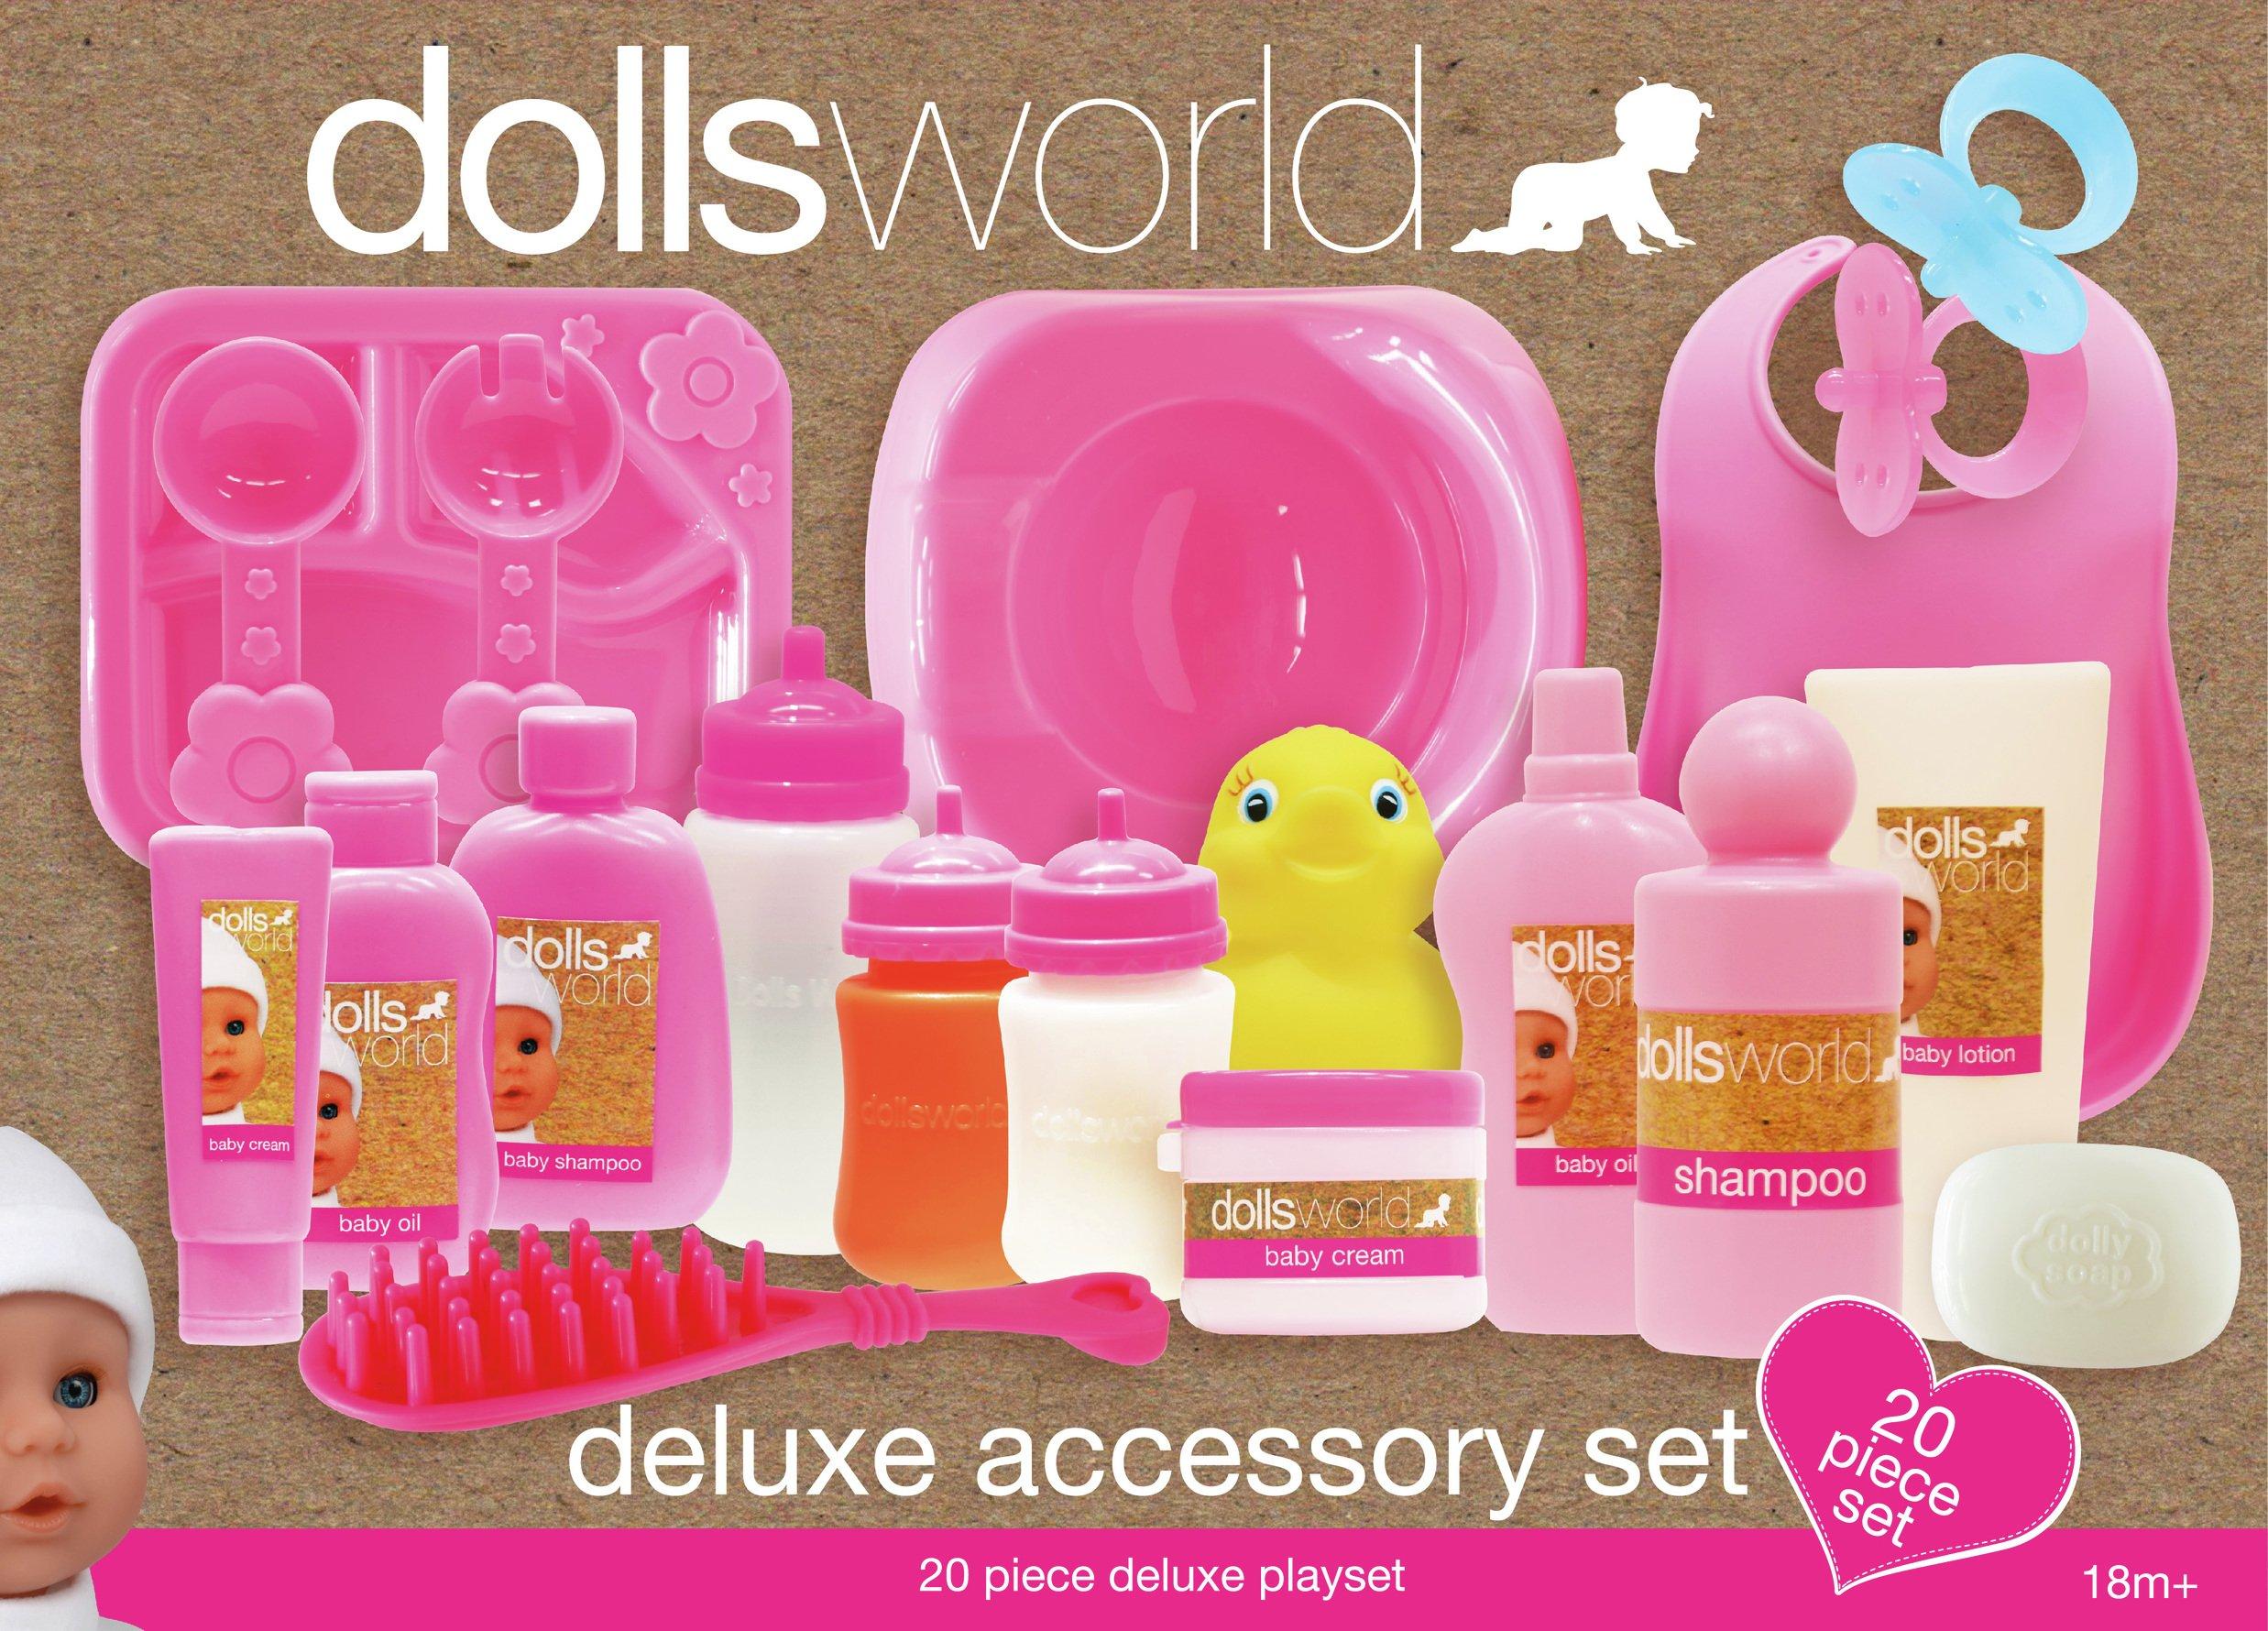 Image of Dollsworld Doll Deluxe Accessory Set.